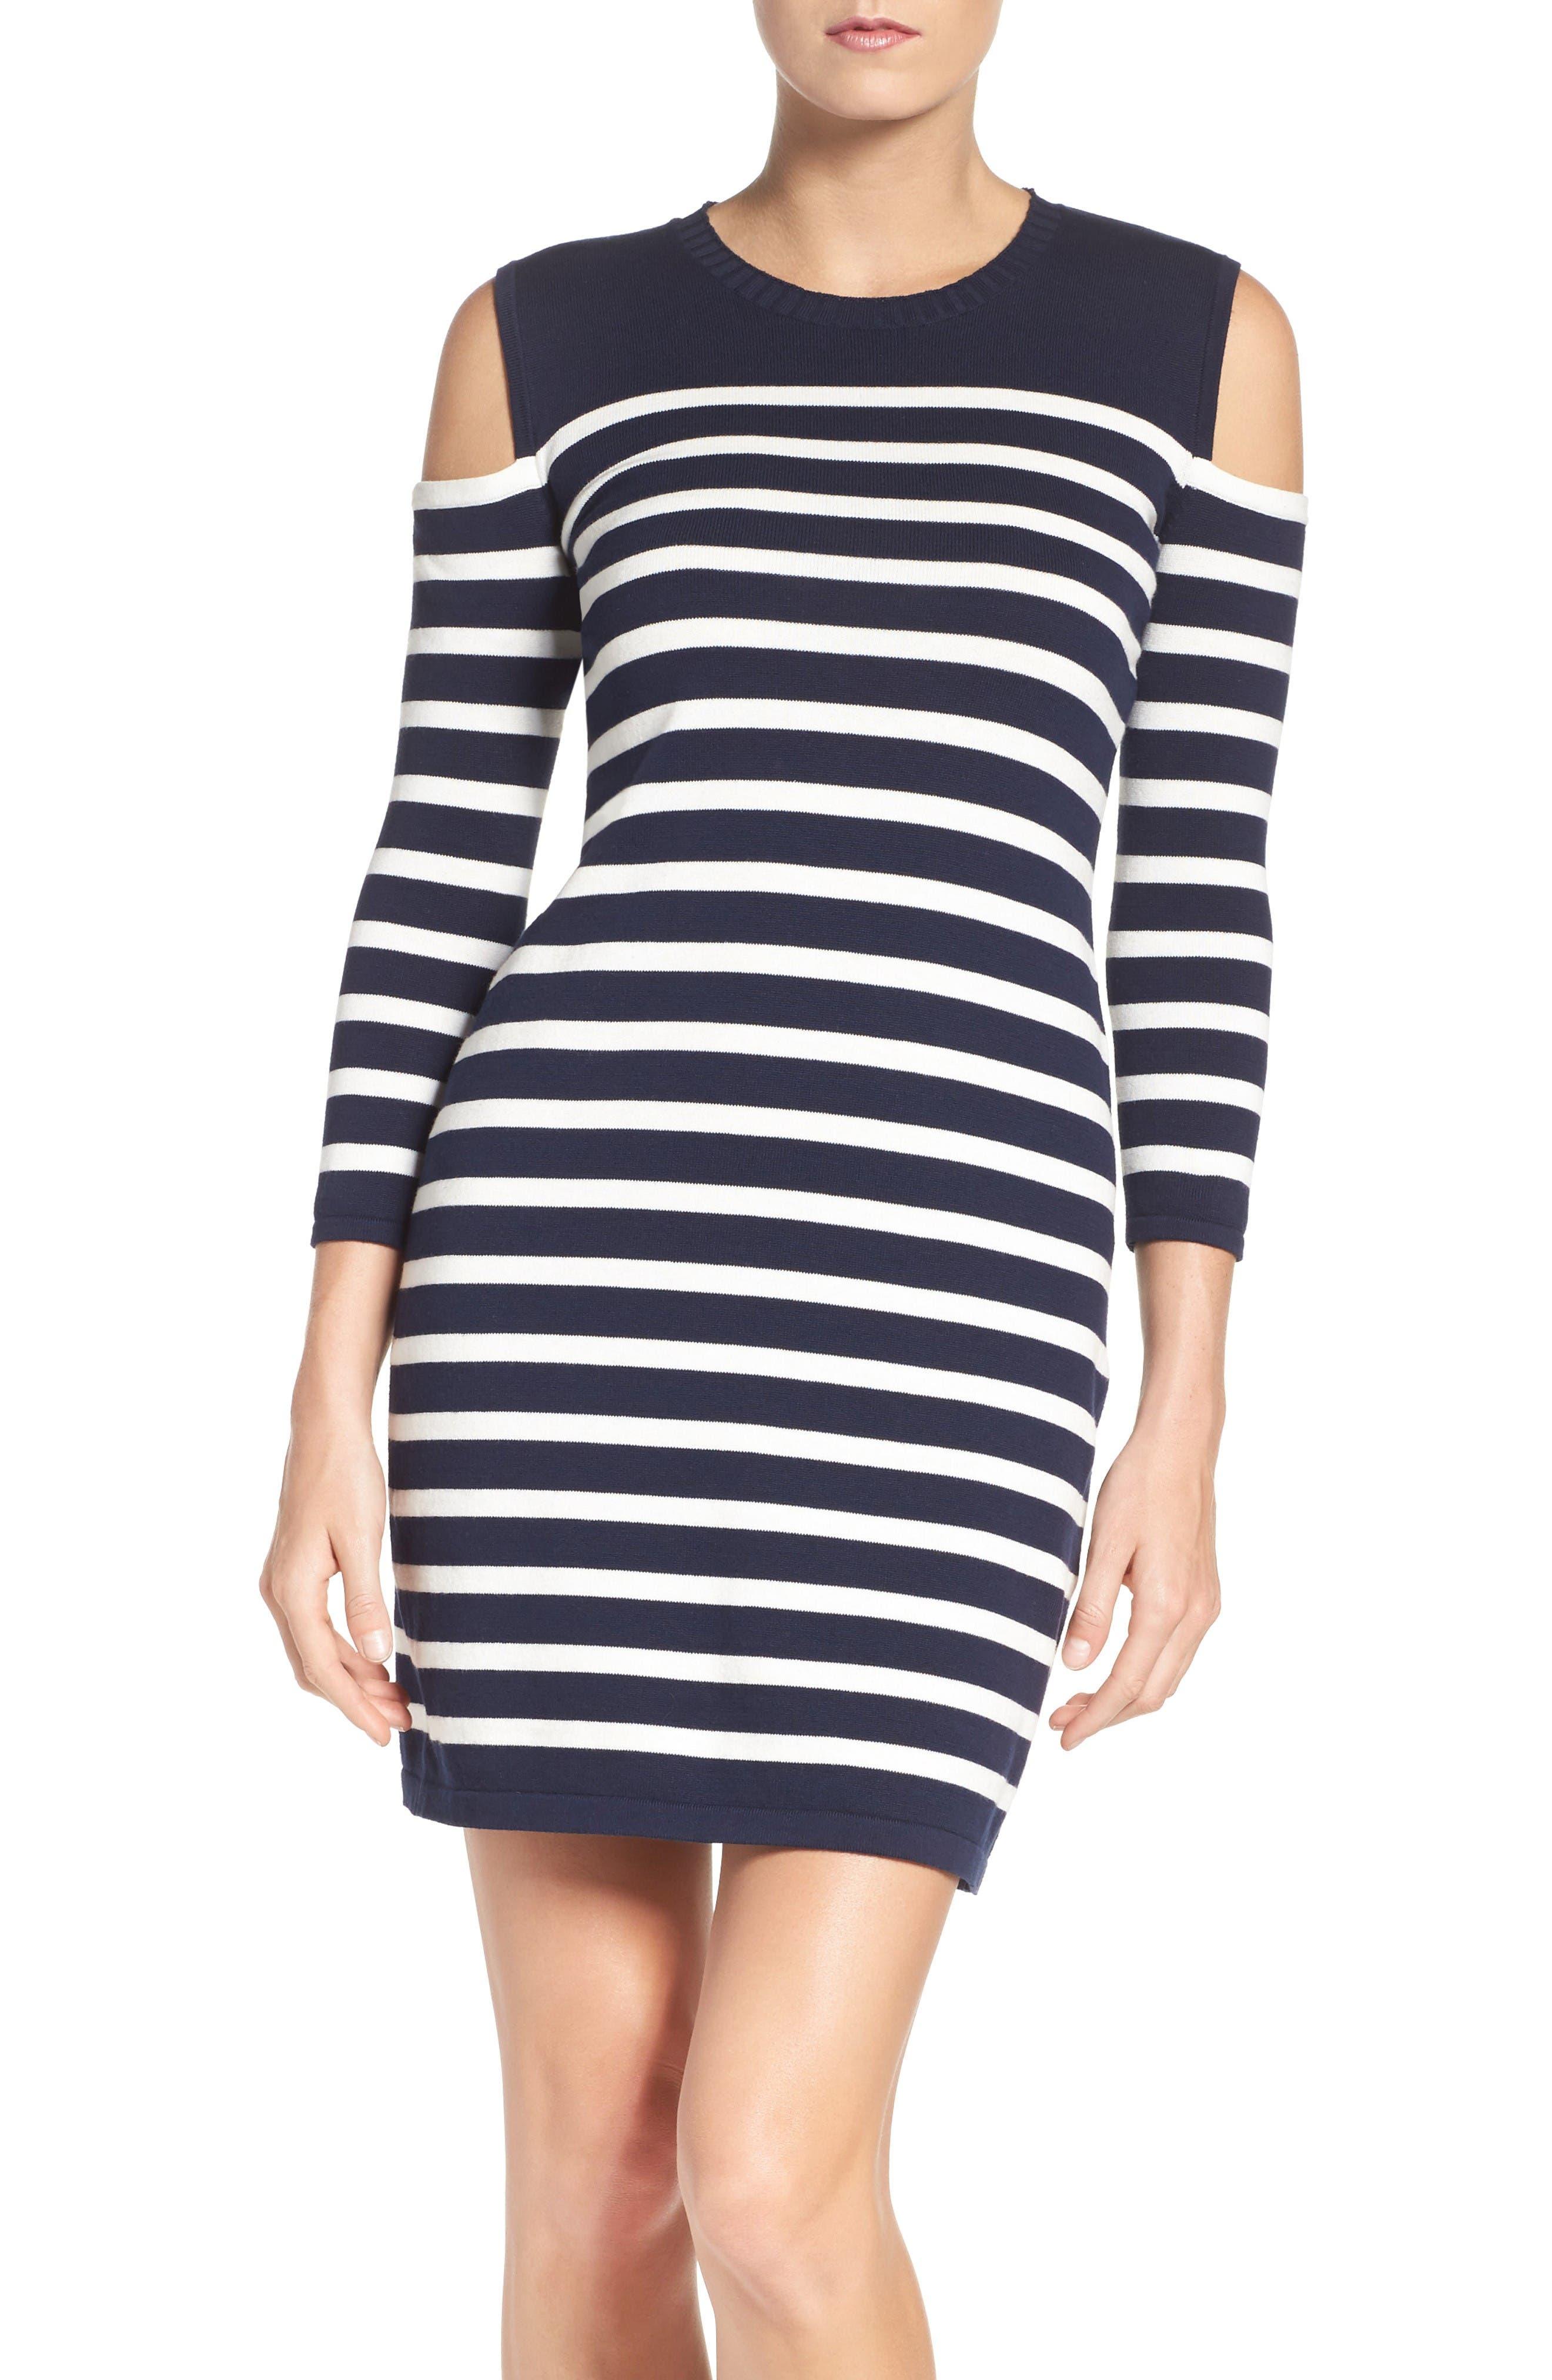 Main Image - Trina Turk Tango Stripe Cotton Knit Dress